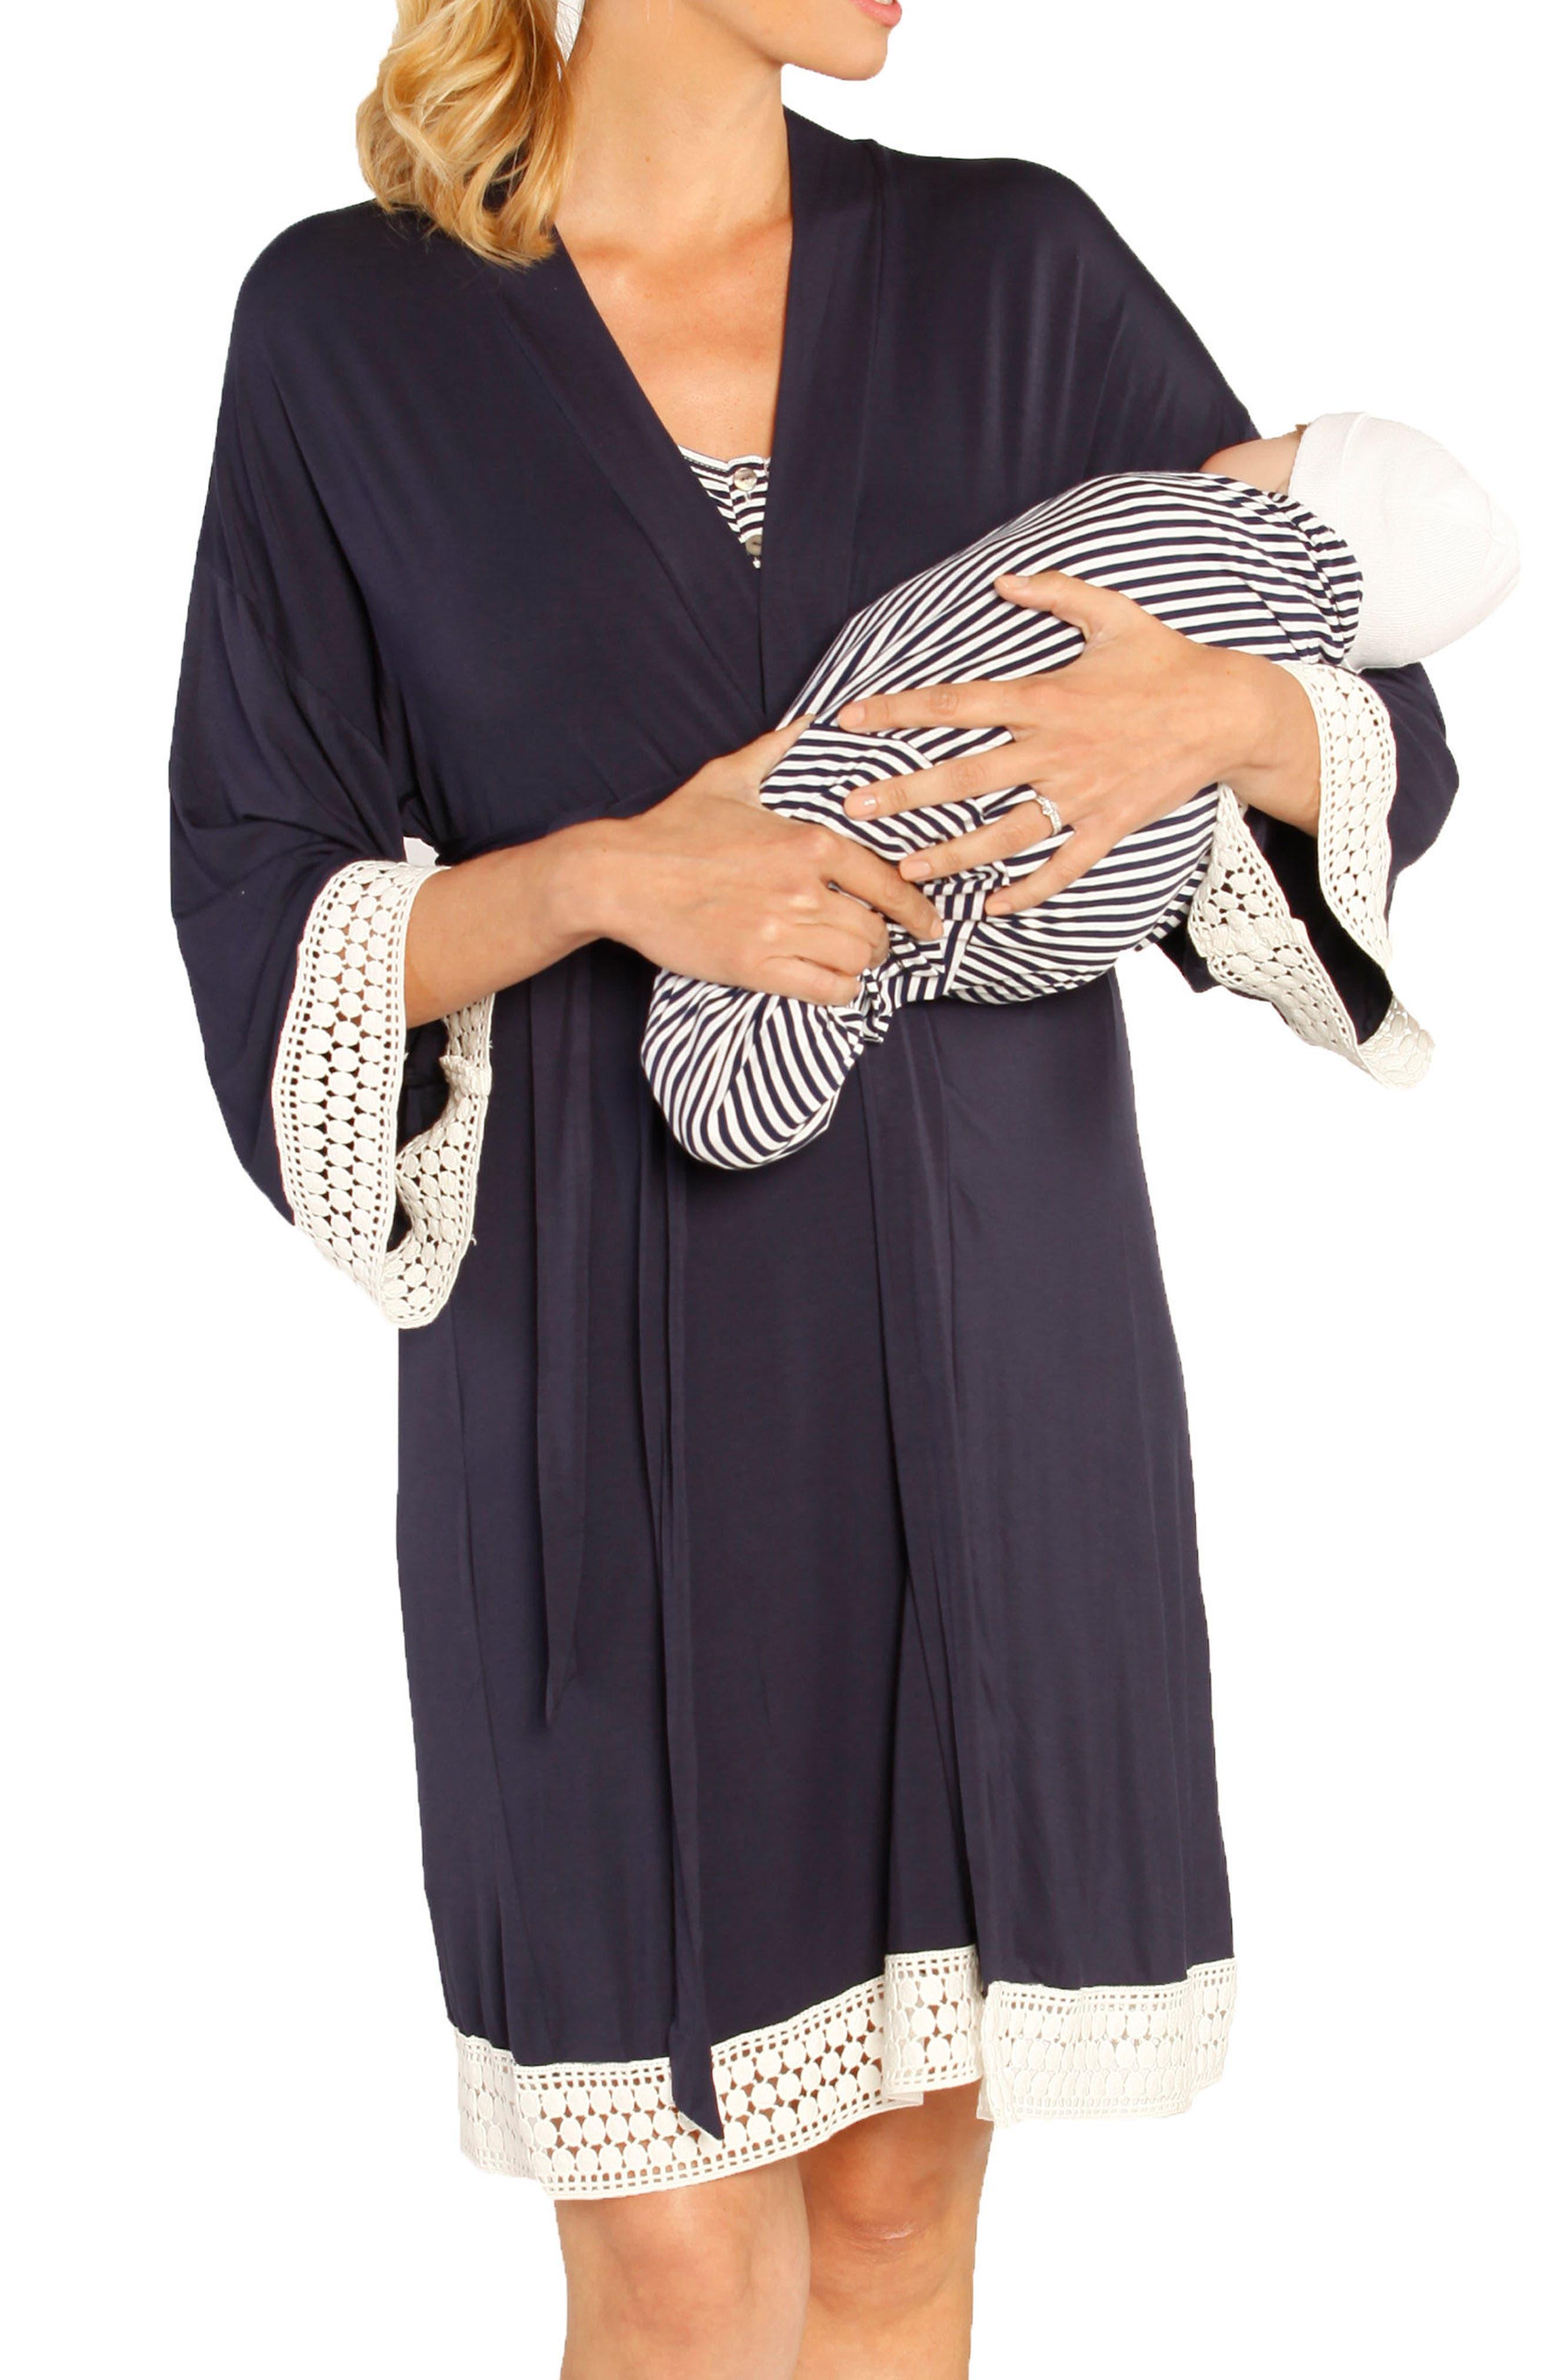 Main Image - Angel Maternity Nursing Dress, Robe & Baby Blanket Pouch Set